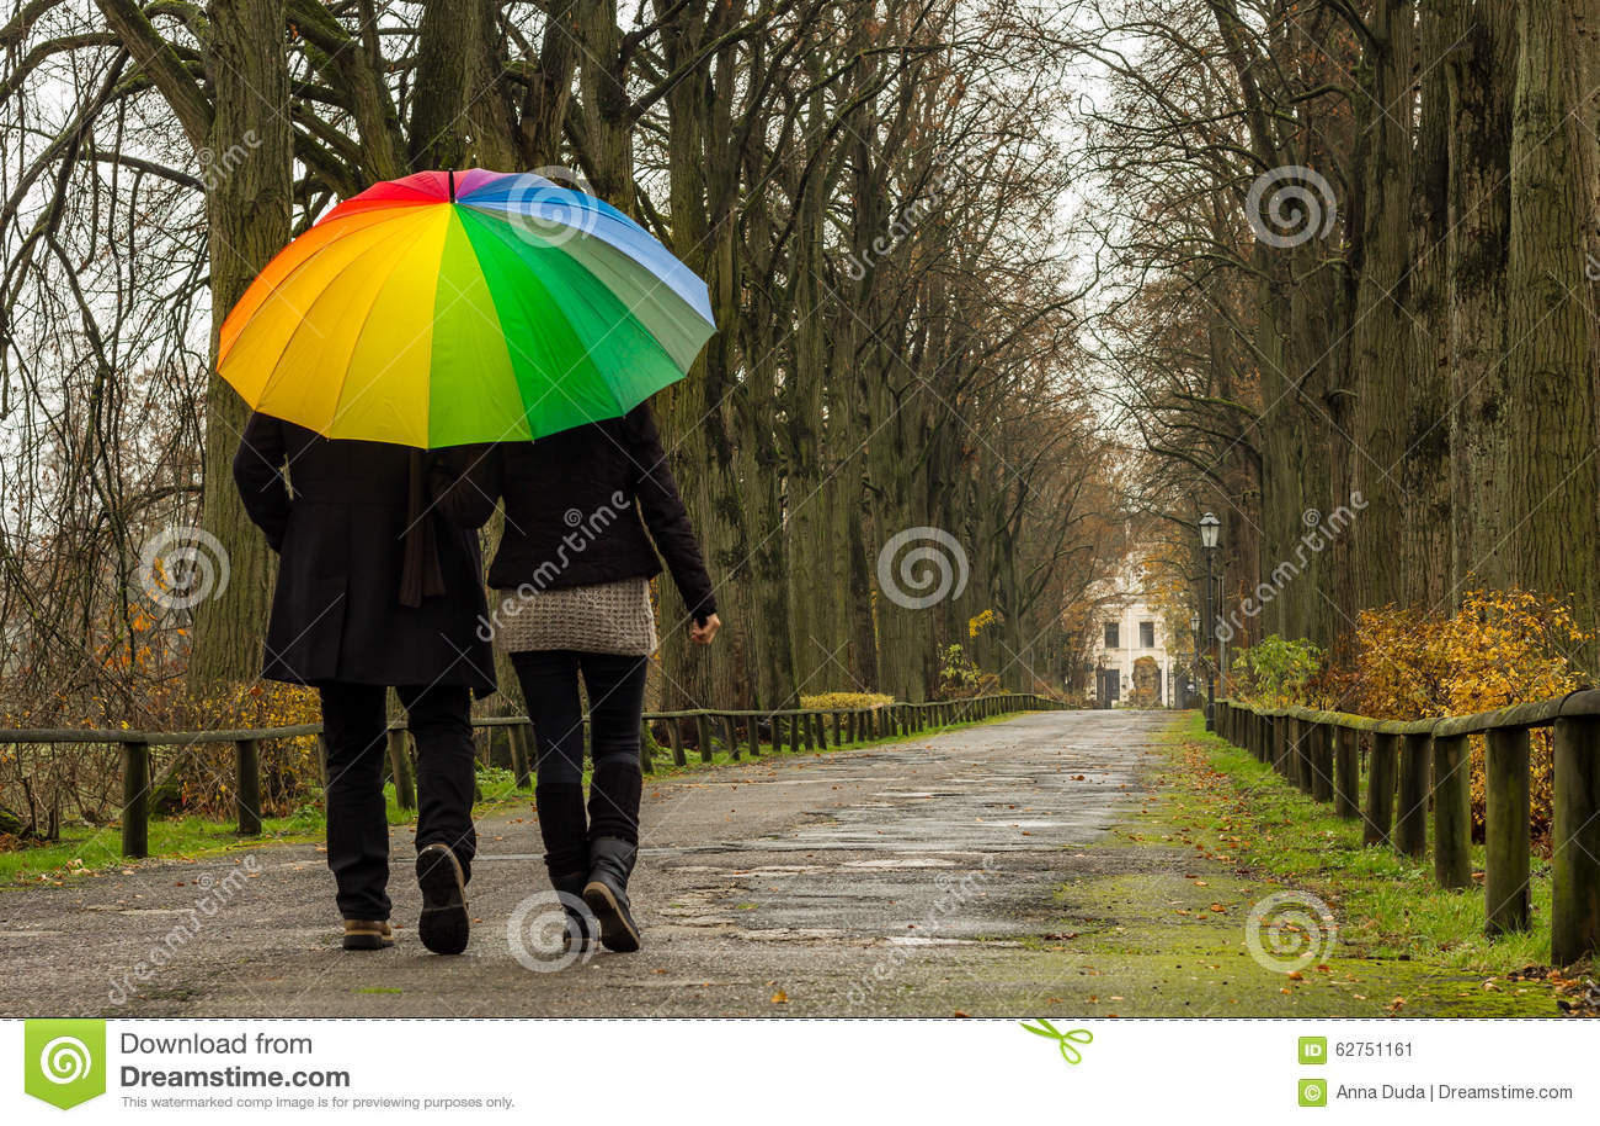 Couple walks under rainbow umbrella